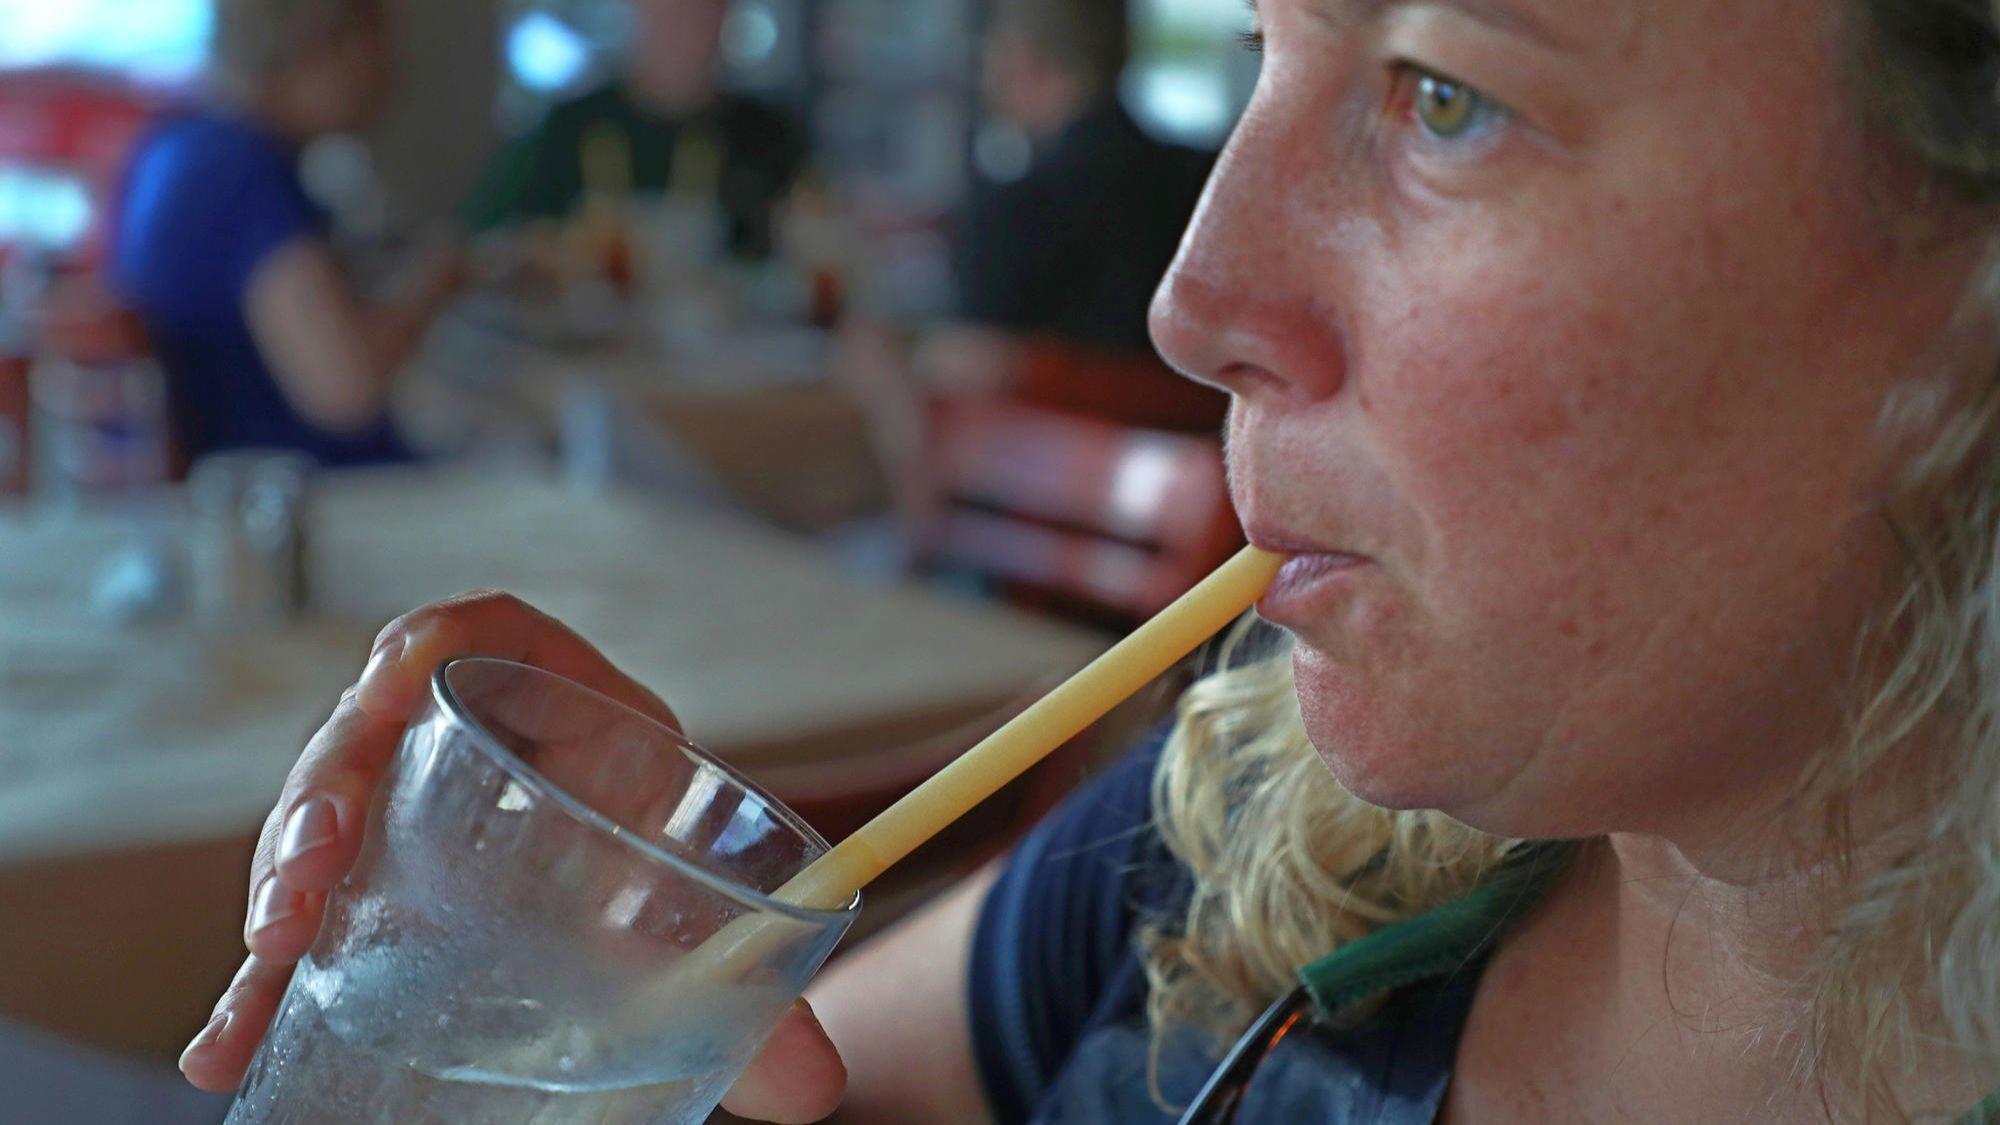 Pasta straws Bars restaurants get creative with plastic straw alternatives  southfloridacom